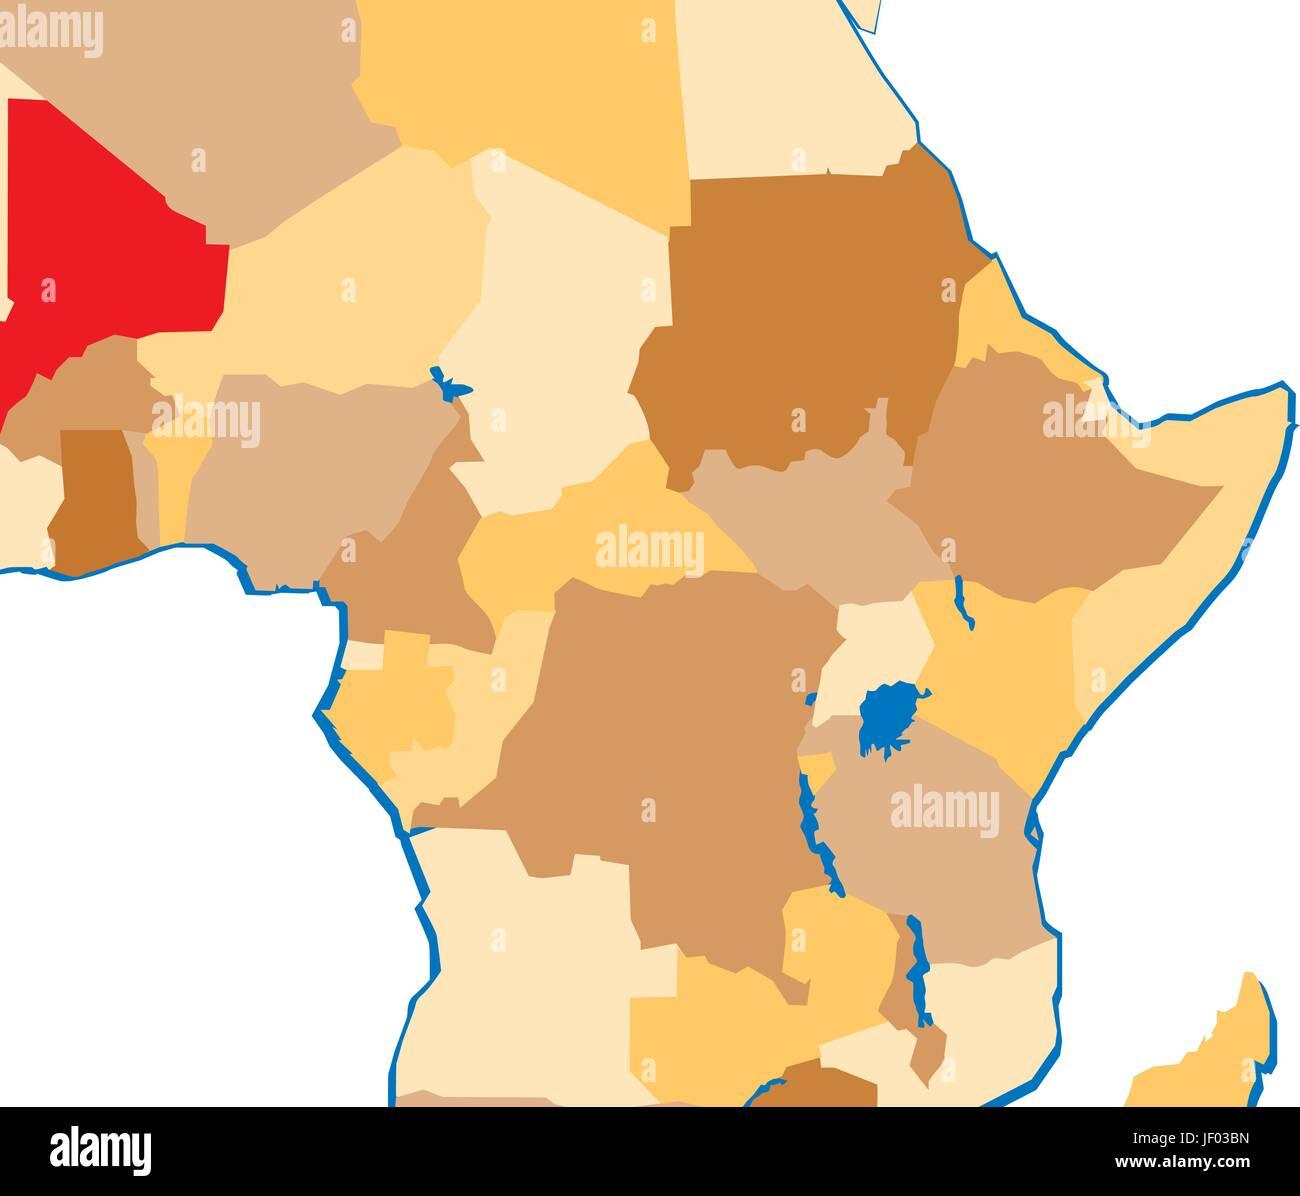 Mali Map Of Africa Stockfotos & Mali Map Of Africa Bilder ...